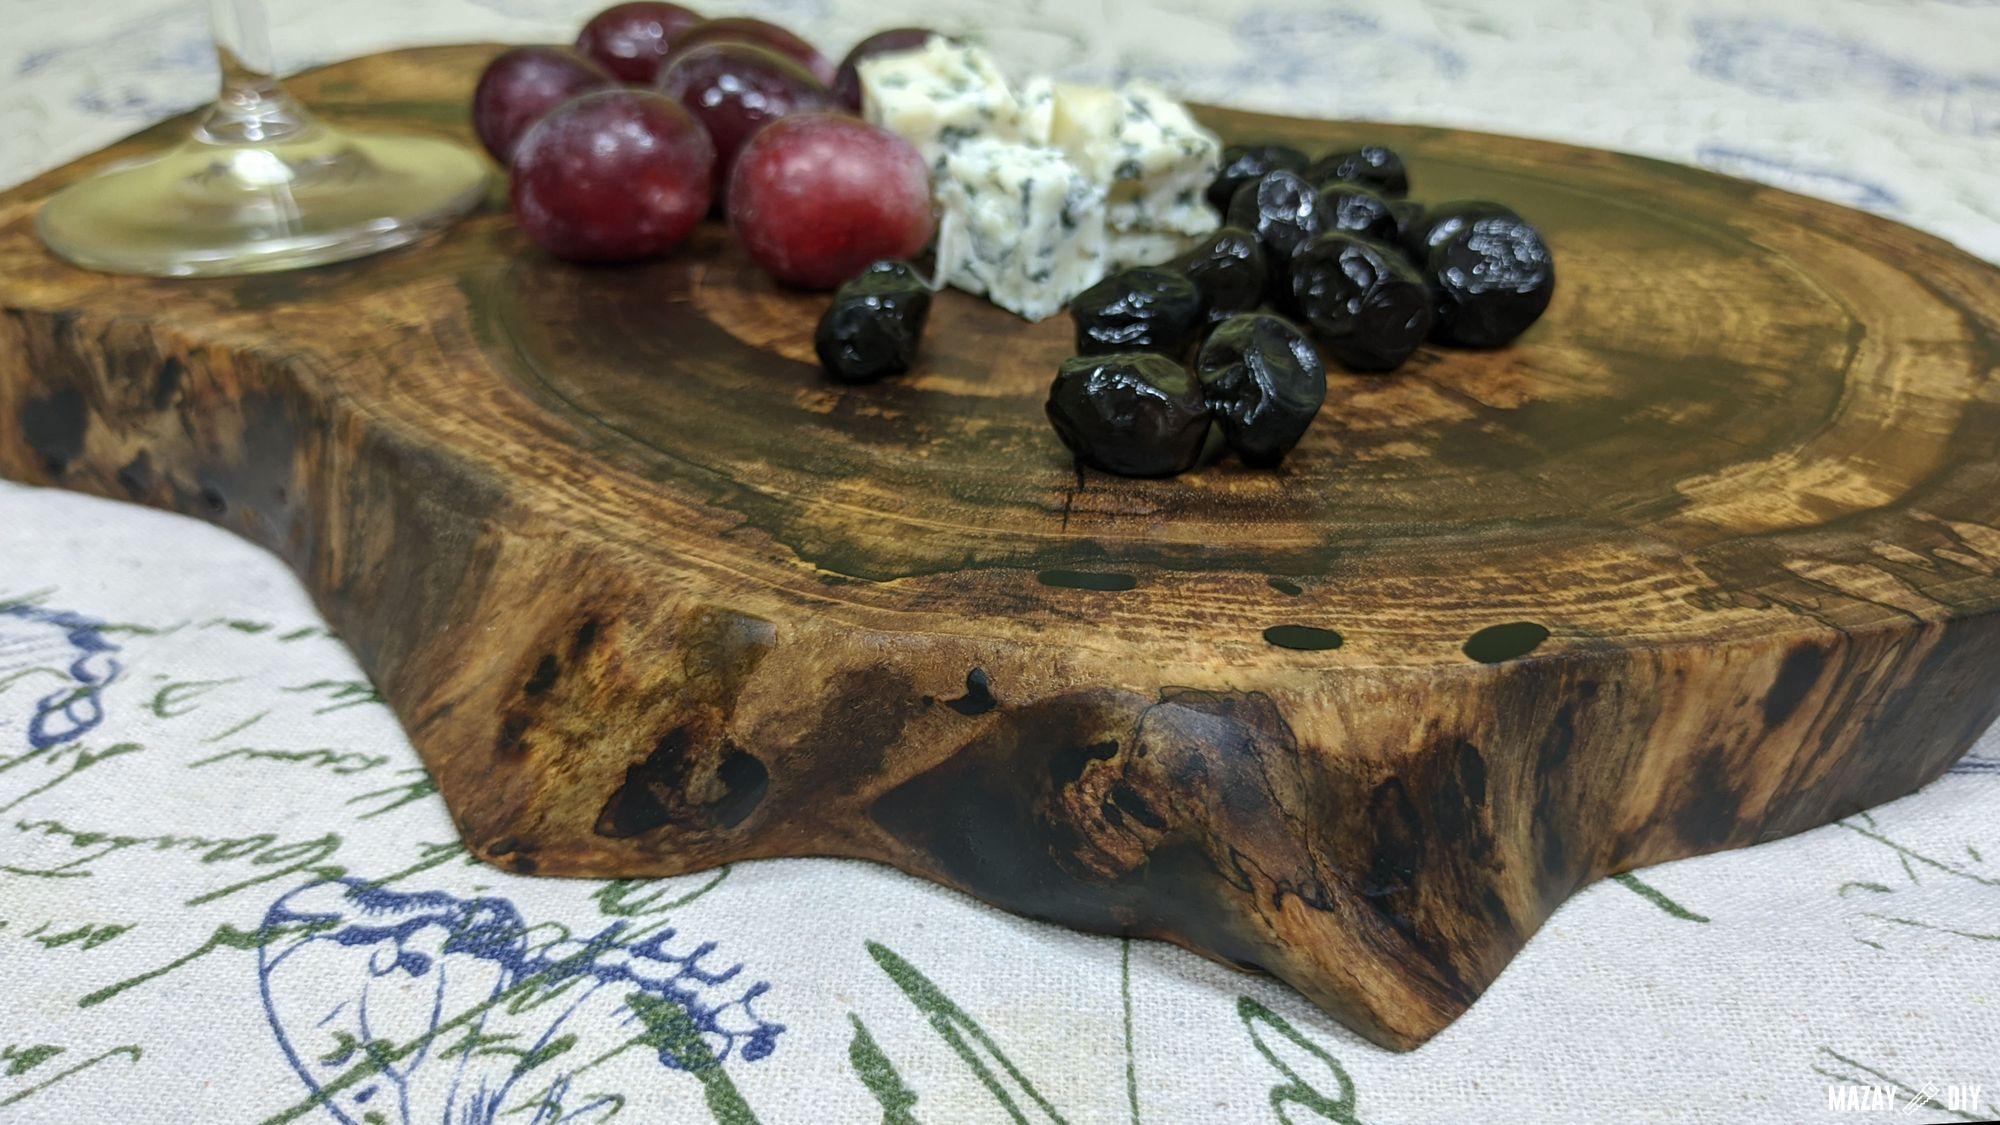 DIY wood serving board